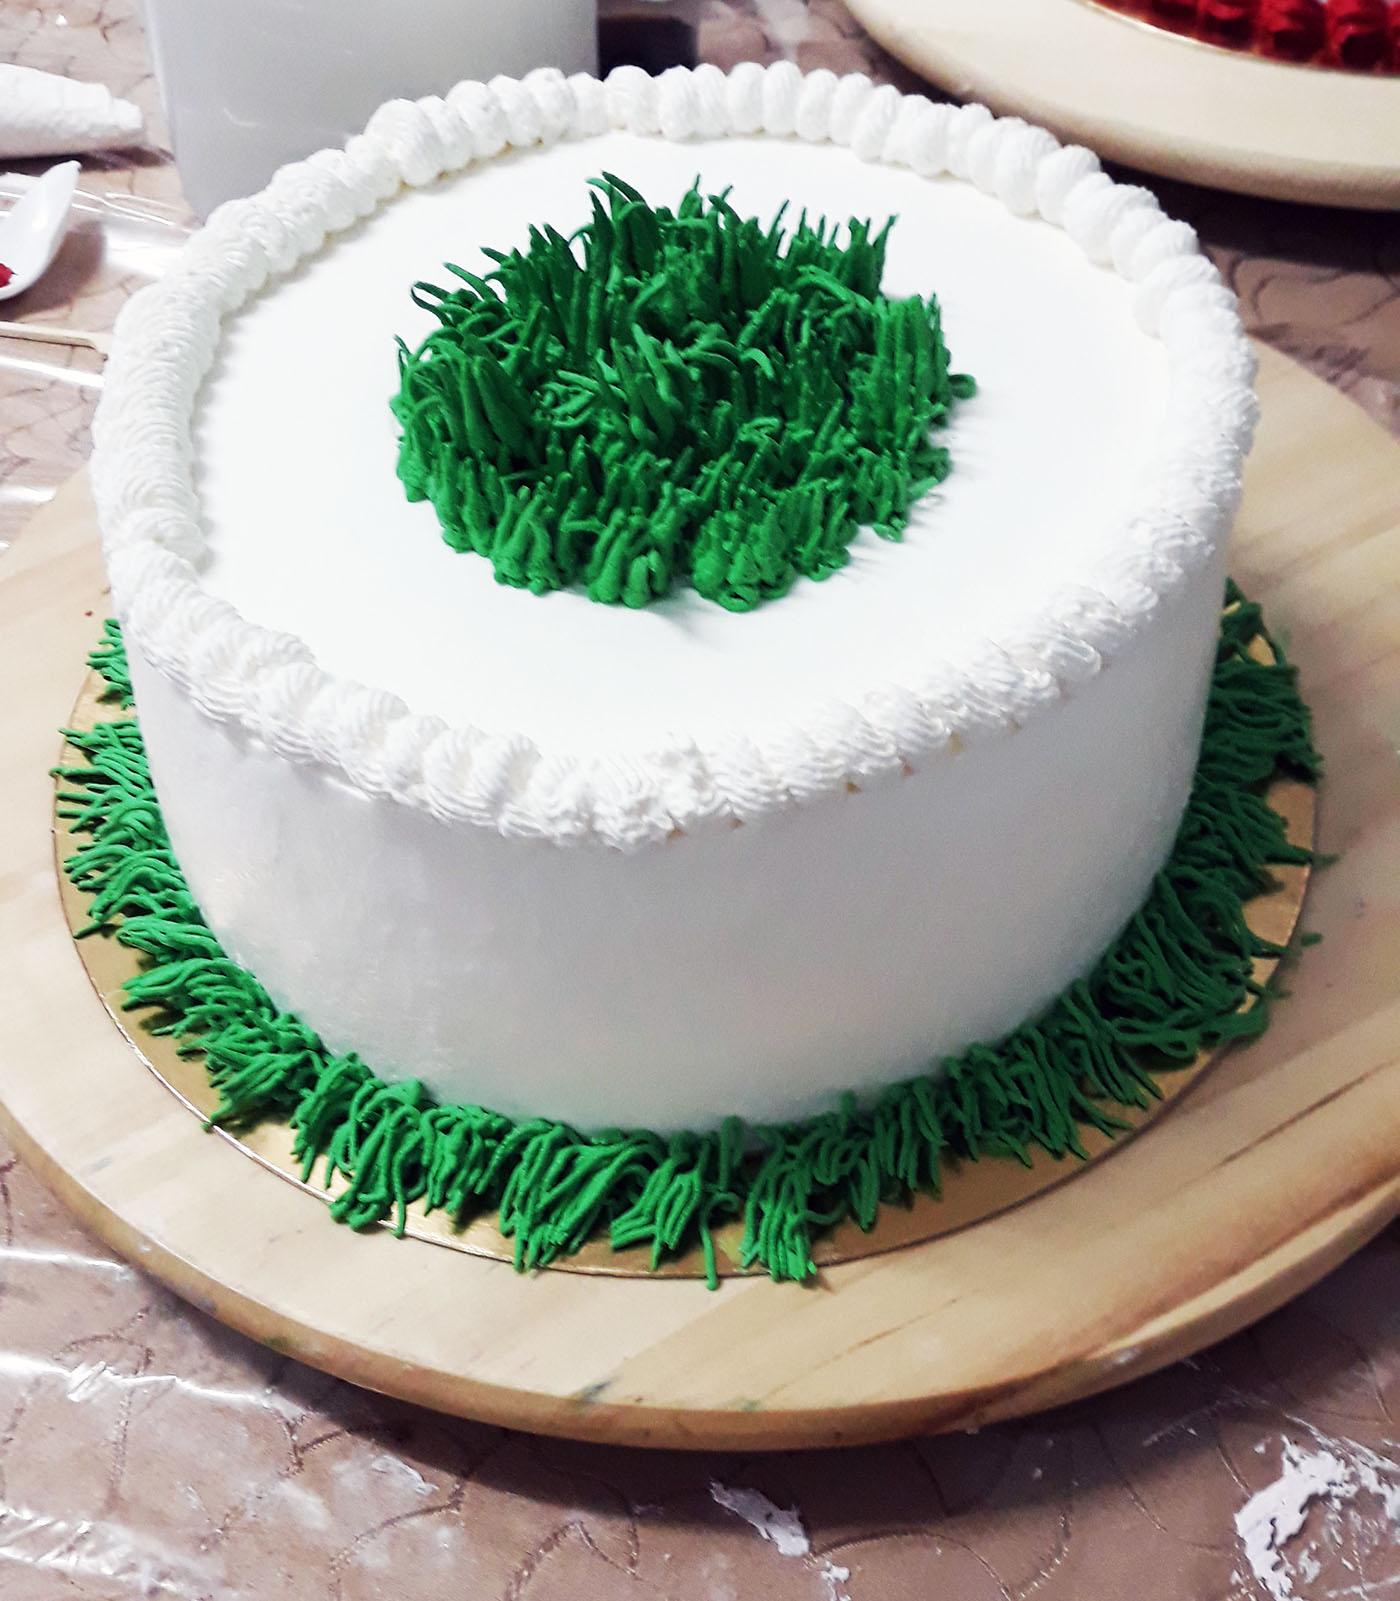 IMG 20190729 WA0034 - עוגת זילוף